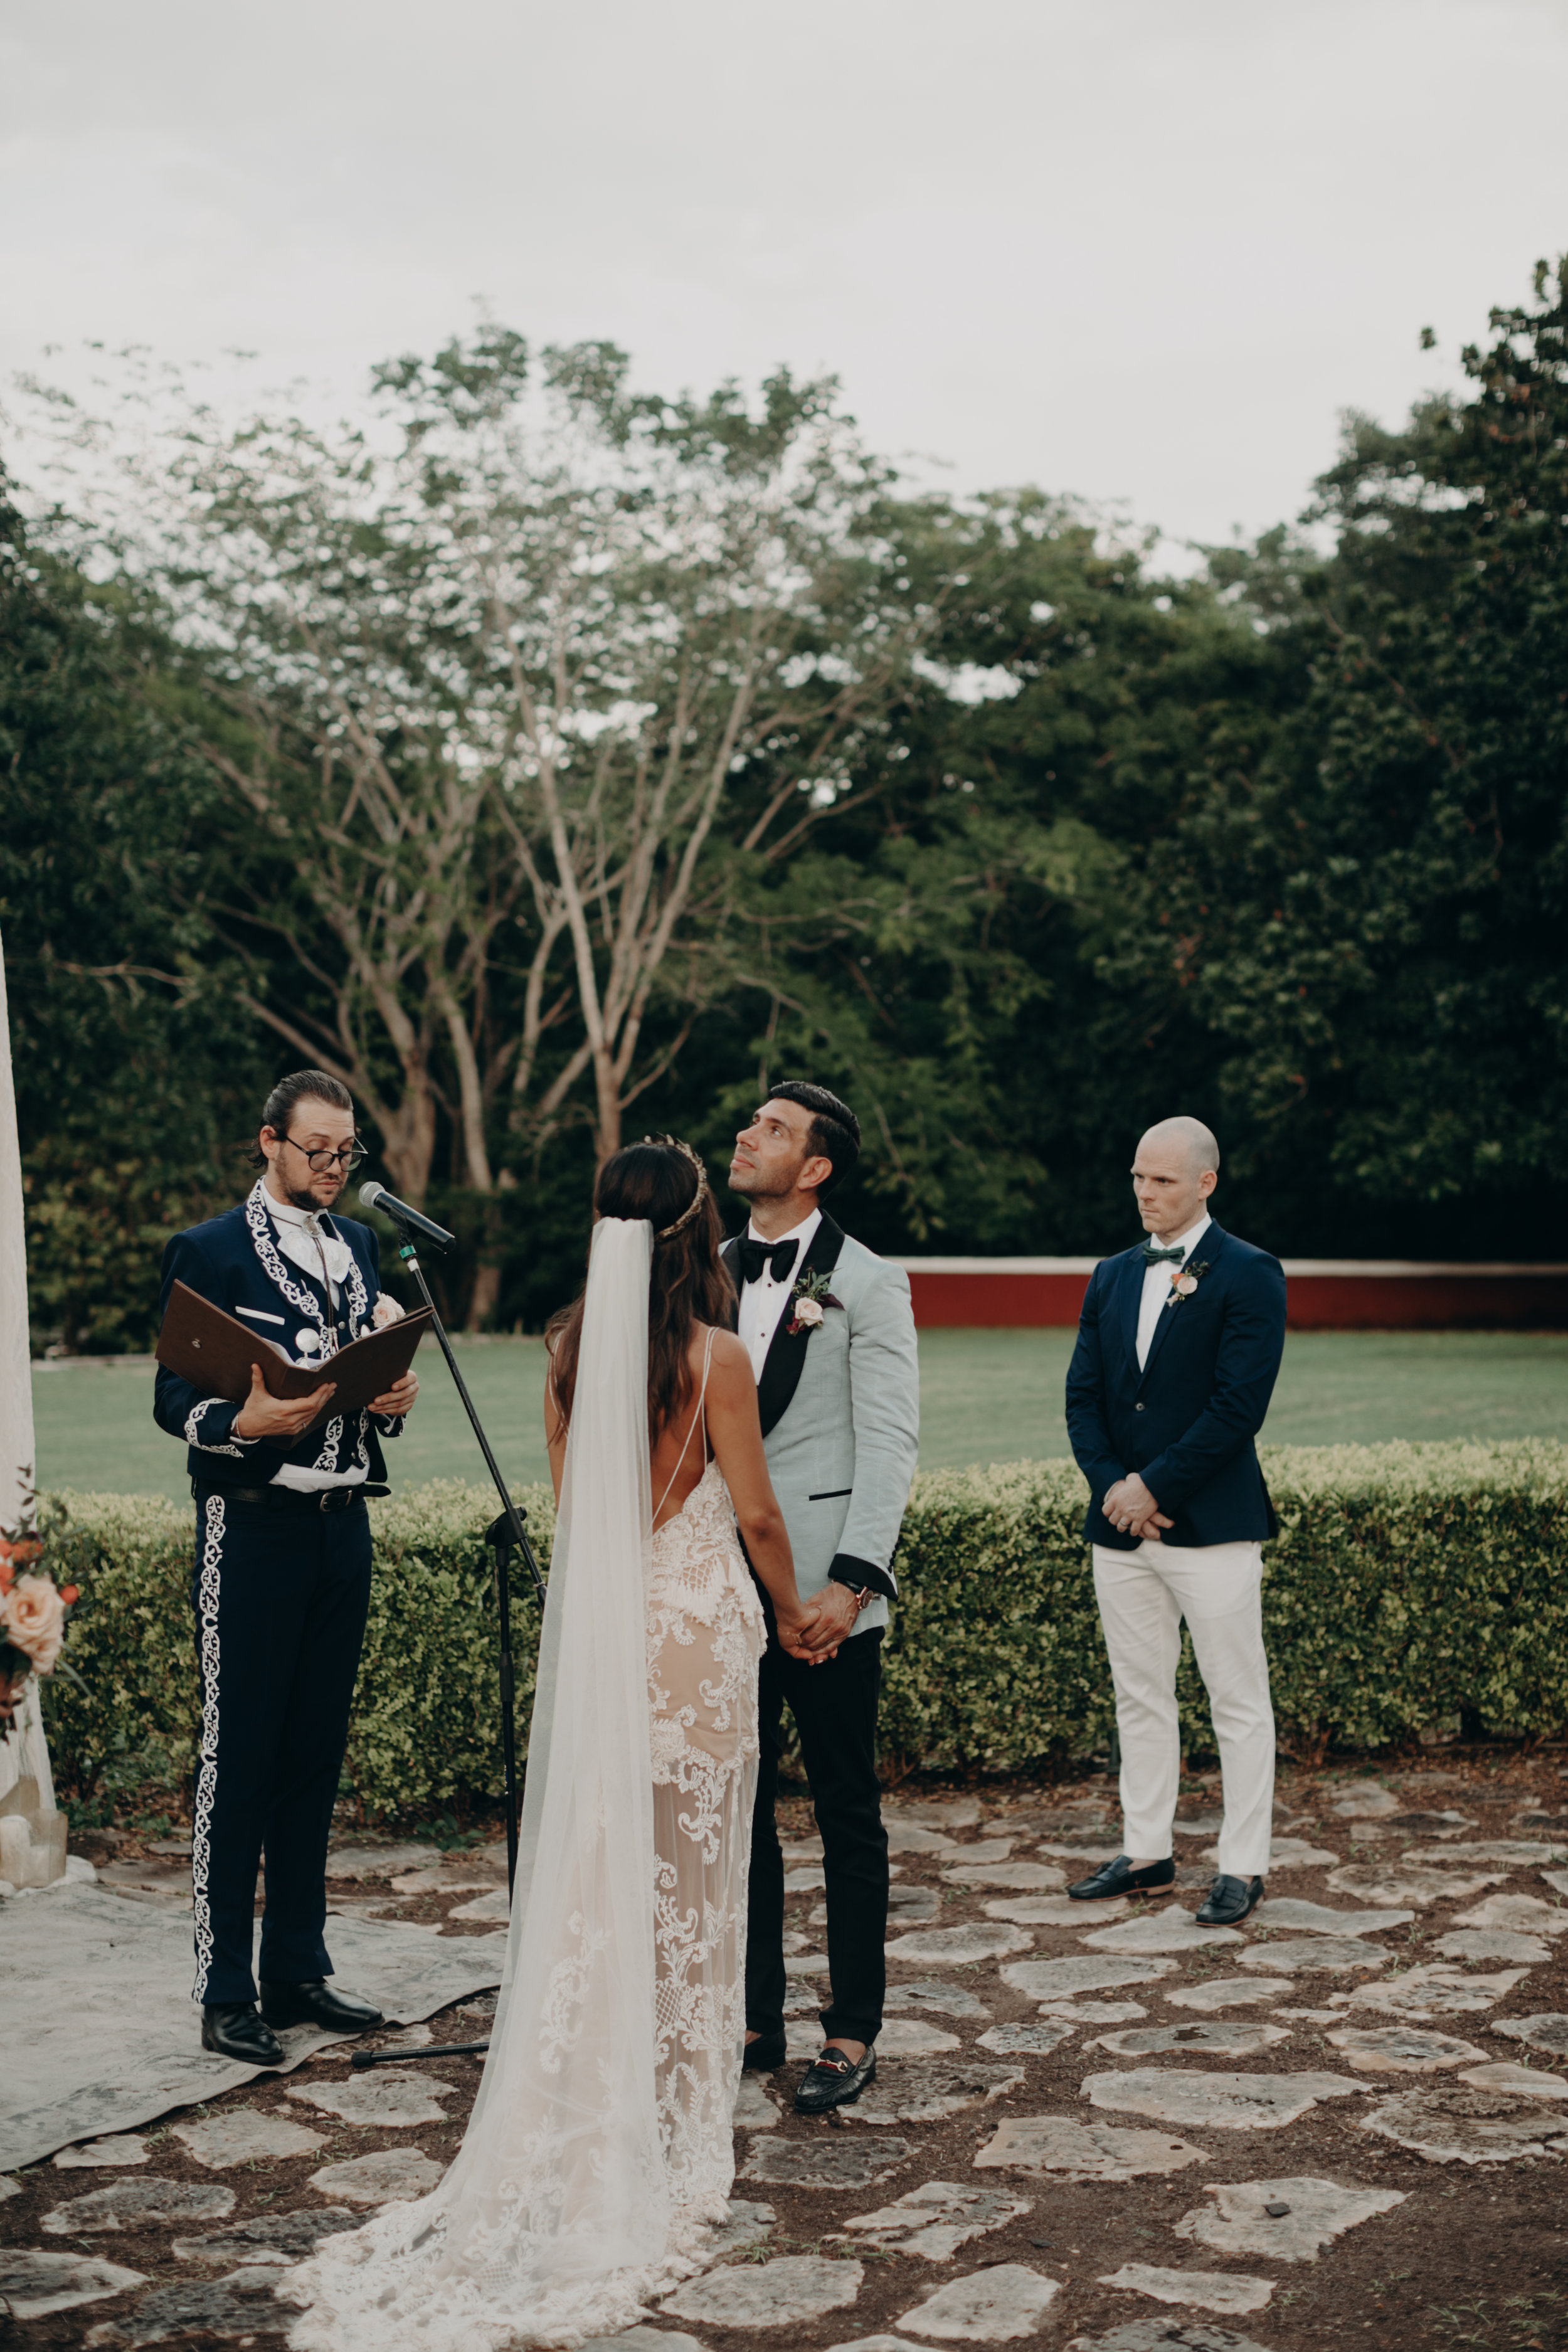 Hacienda Temozon Yucatan Mexico Wedding | Ida & Peter Emily Magers Photography-1061.jpg